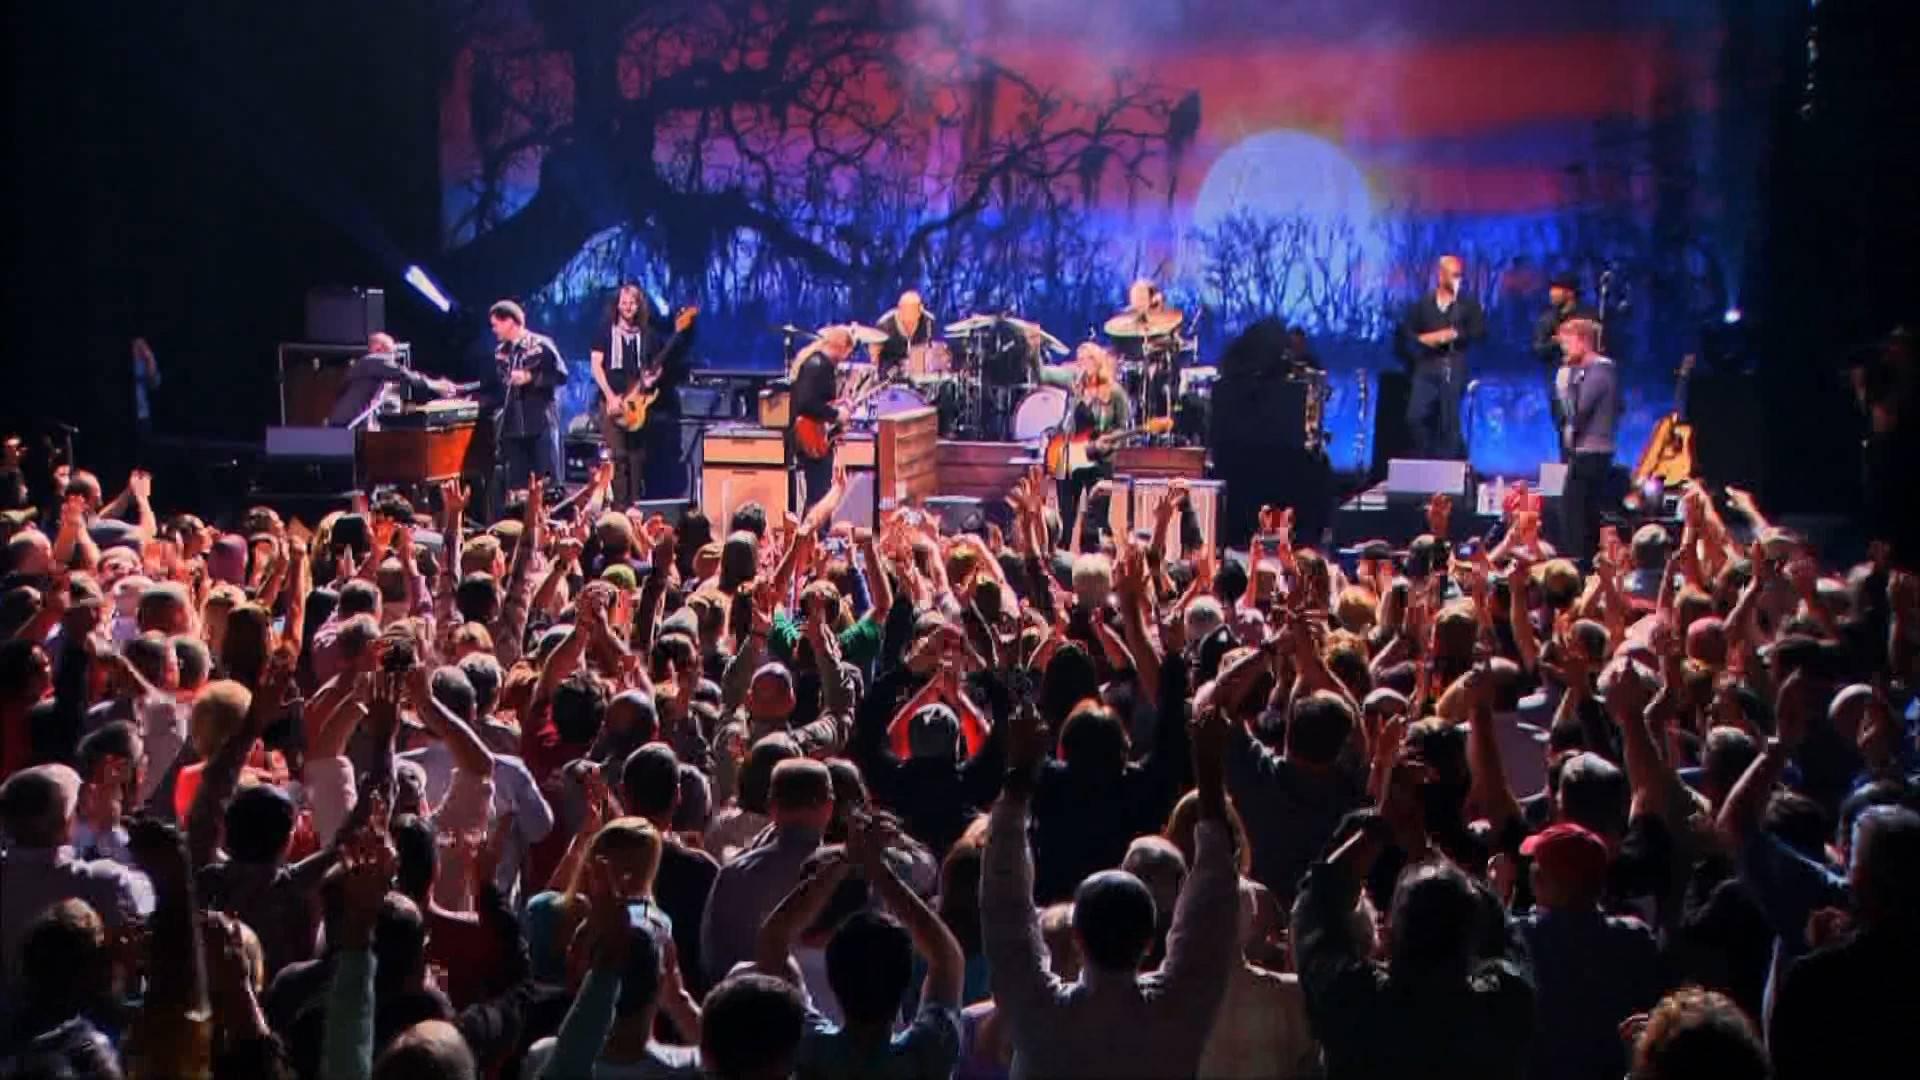 Tedeschi Trucks Band Infinity Hall Live 2015 Hdtv 1080i